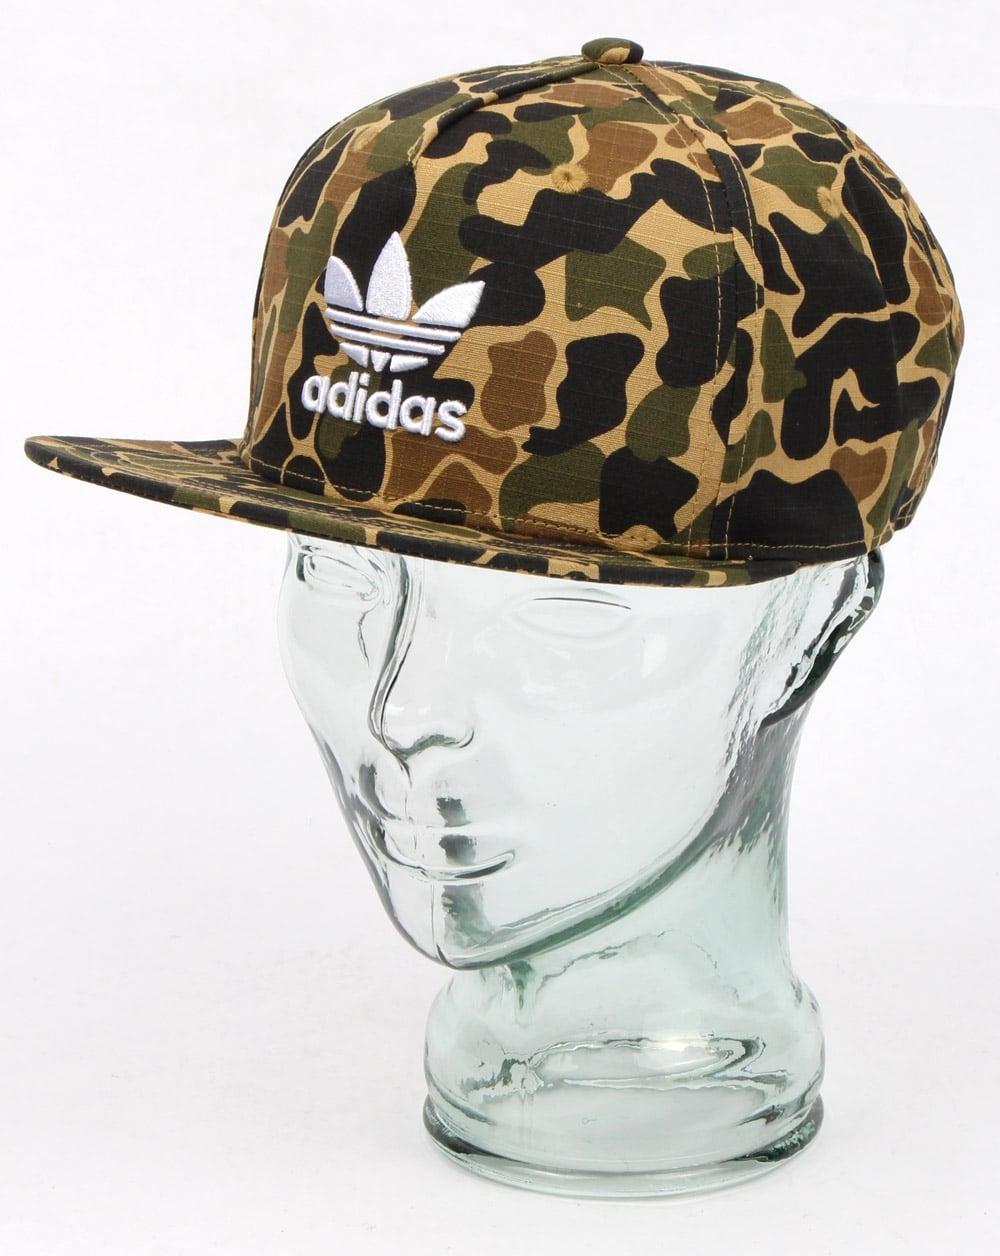 adidas Originals Adidas Originals Camo Snapback Cap Dark Sahara 4910940100d